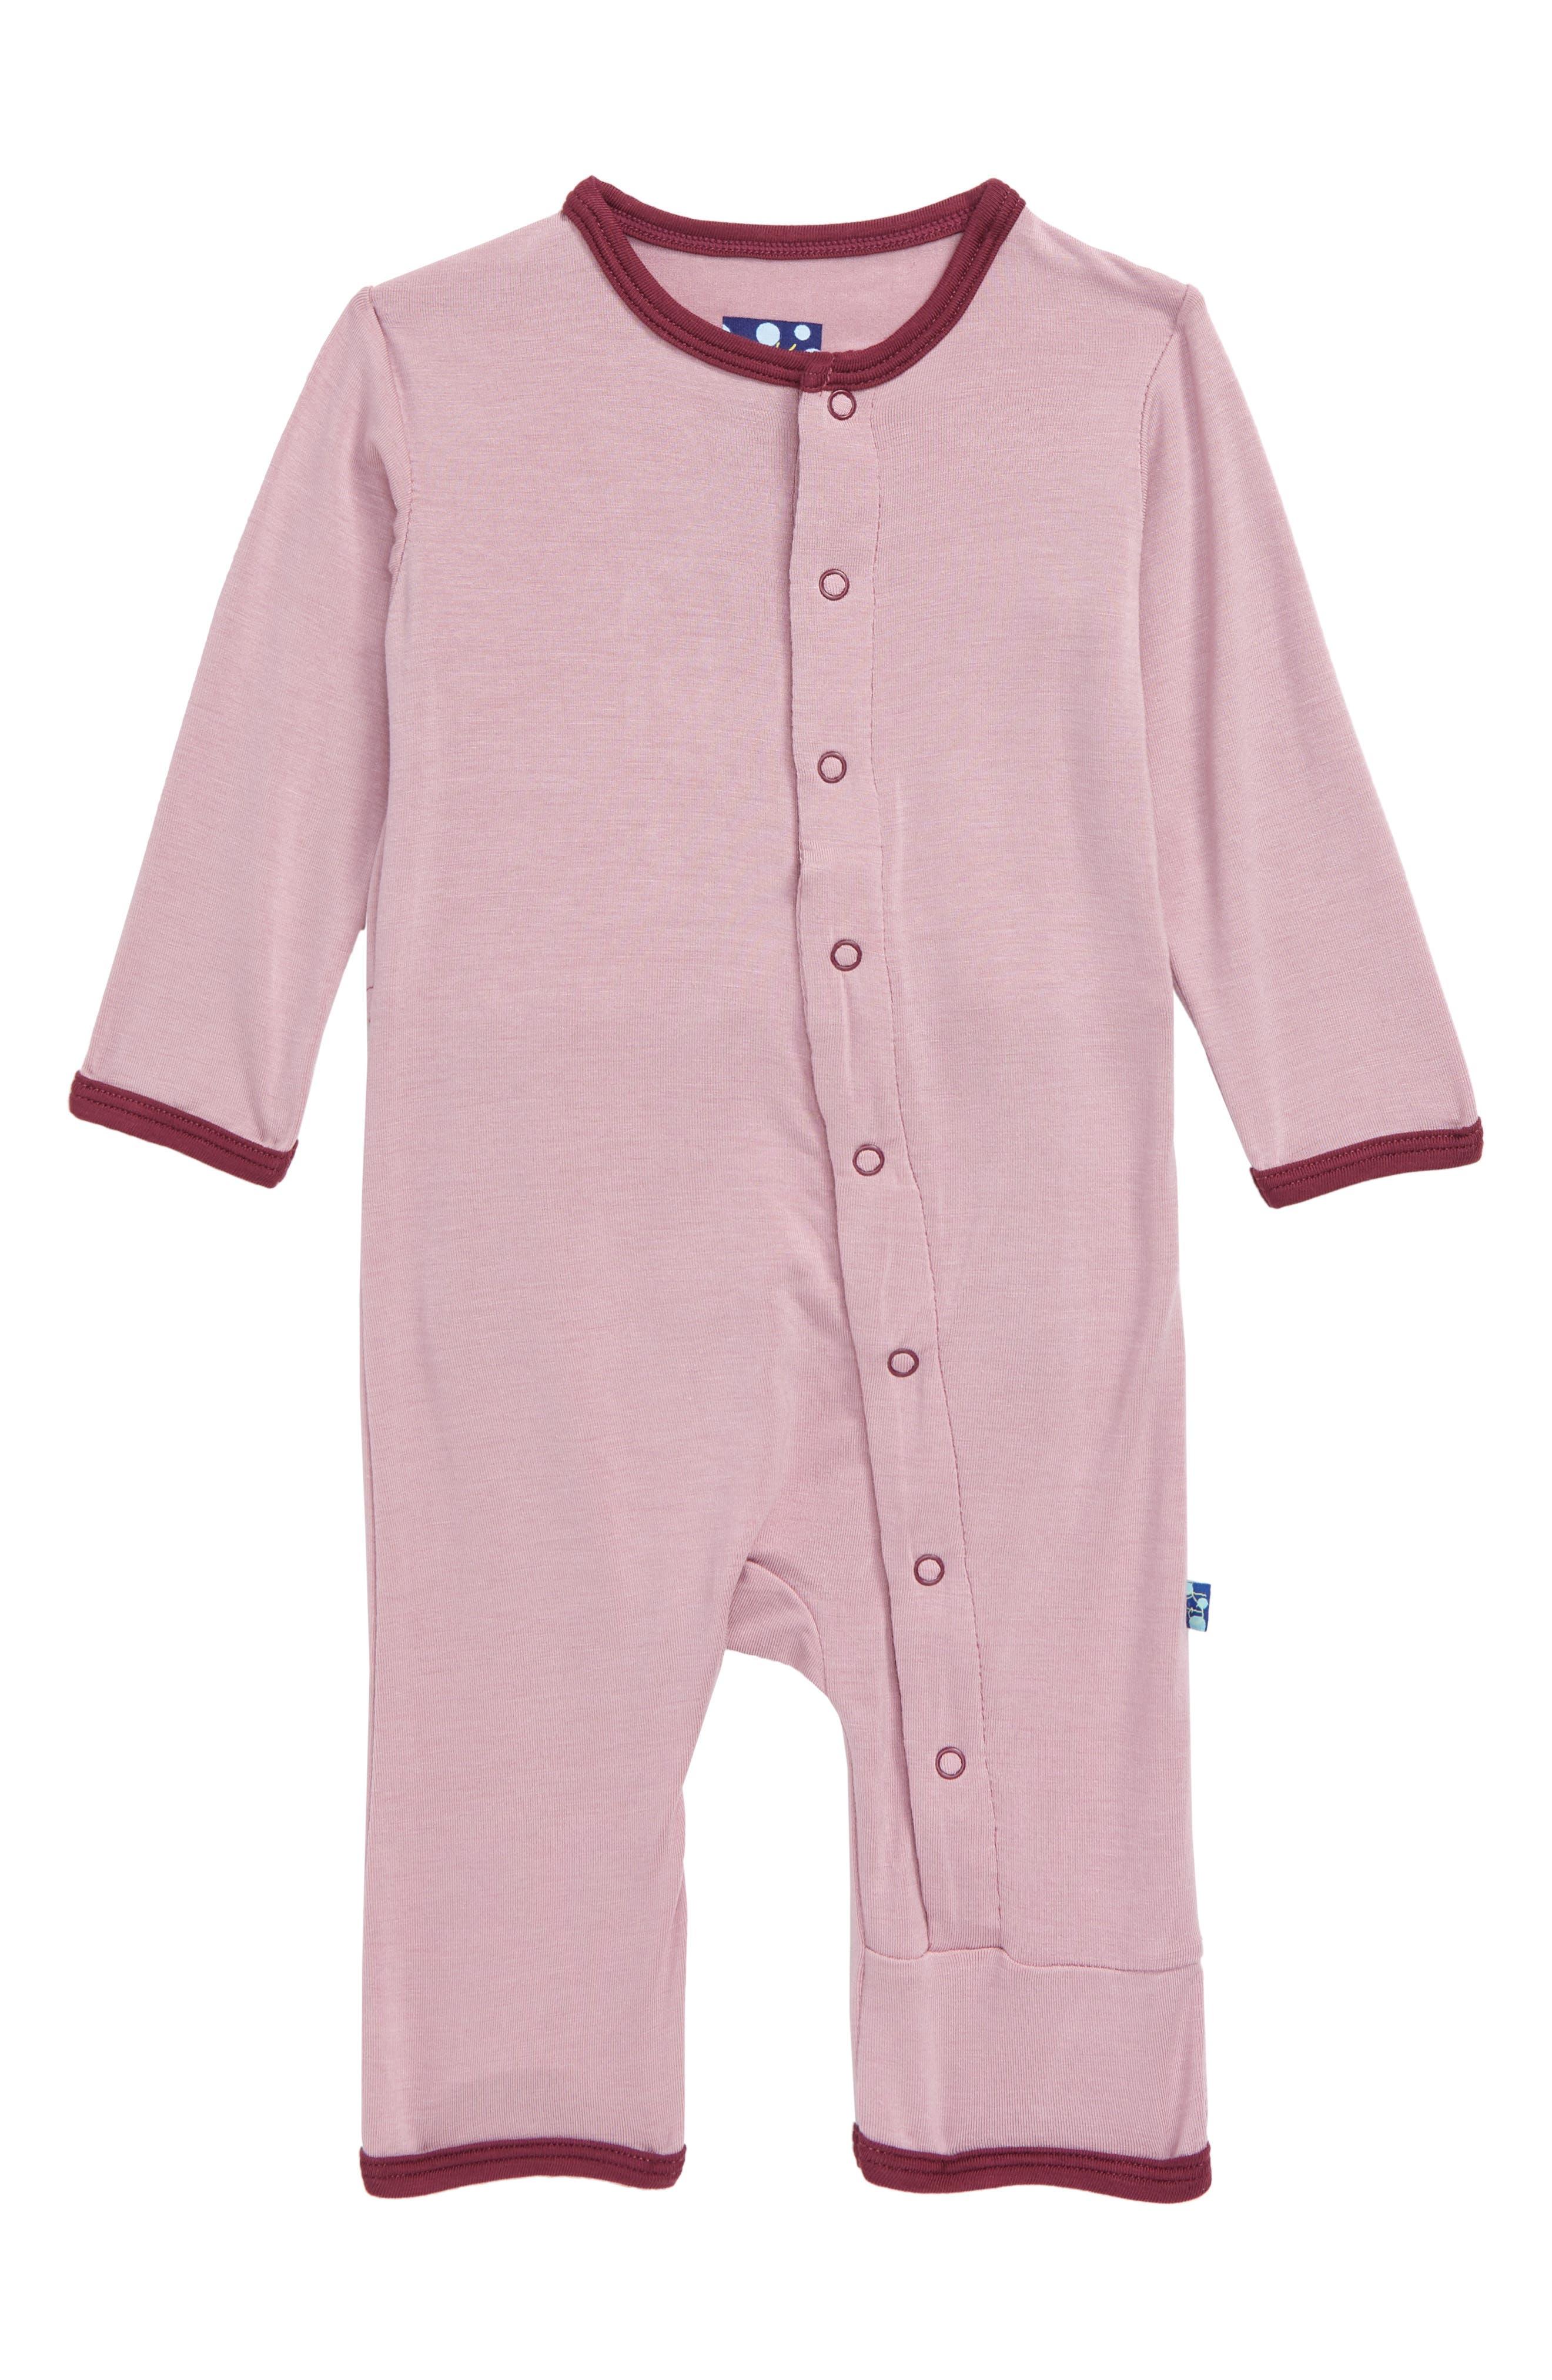 Infant Girls Kickee Pants Dino Applique Romper Size 69M  Pink